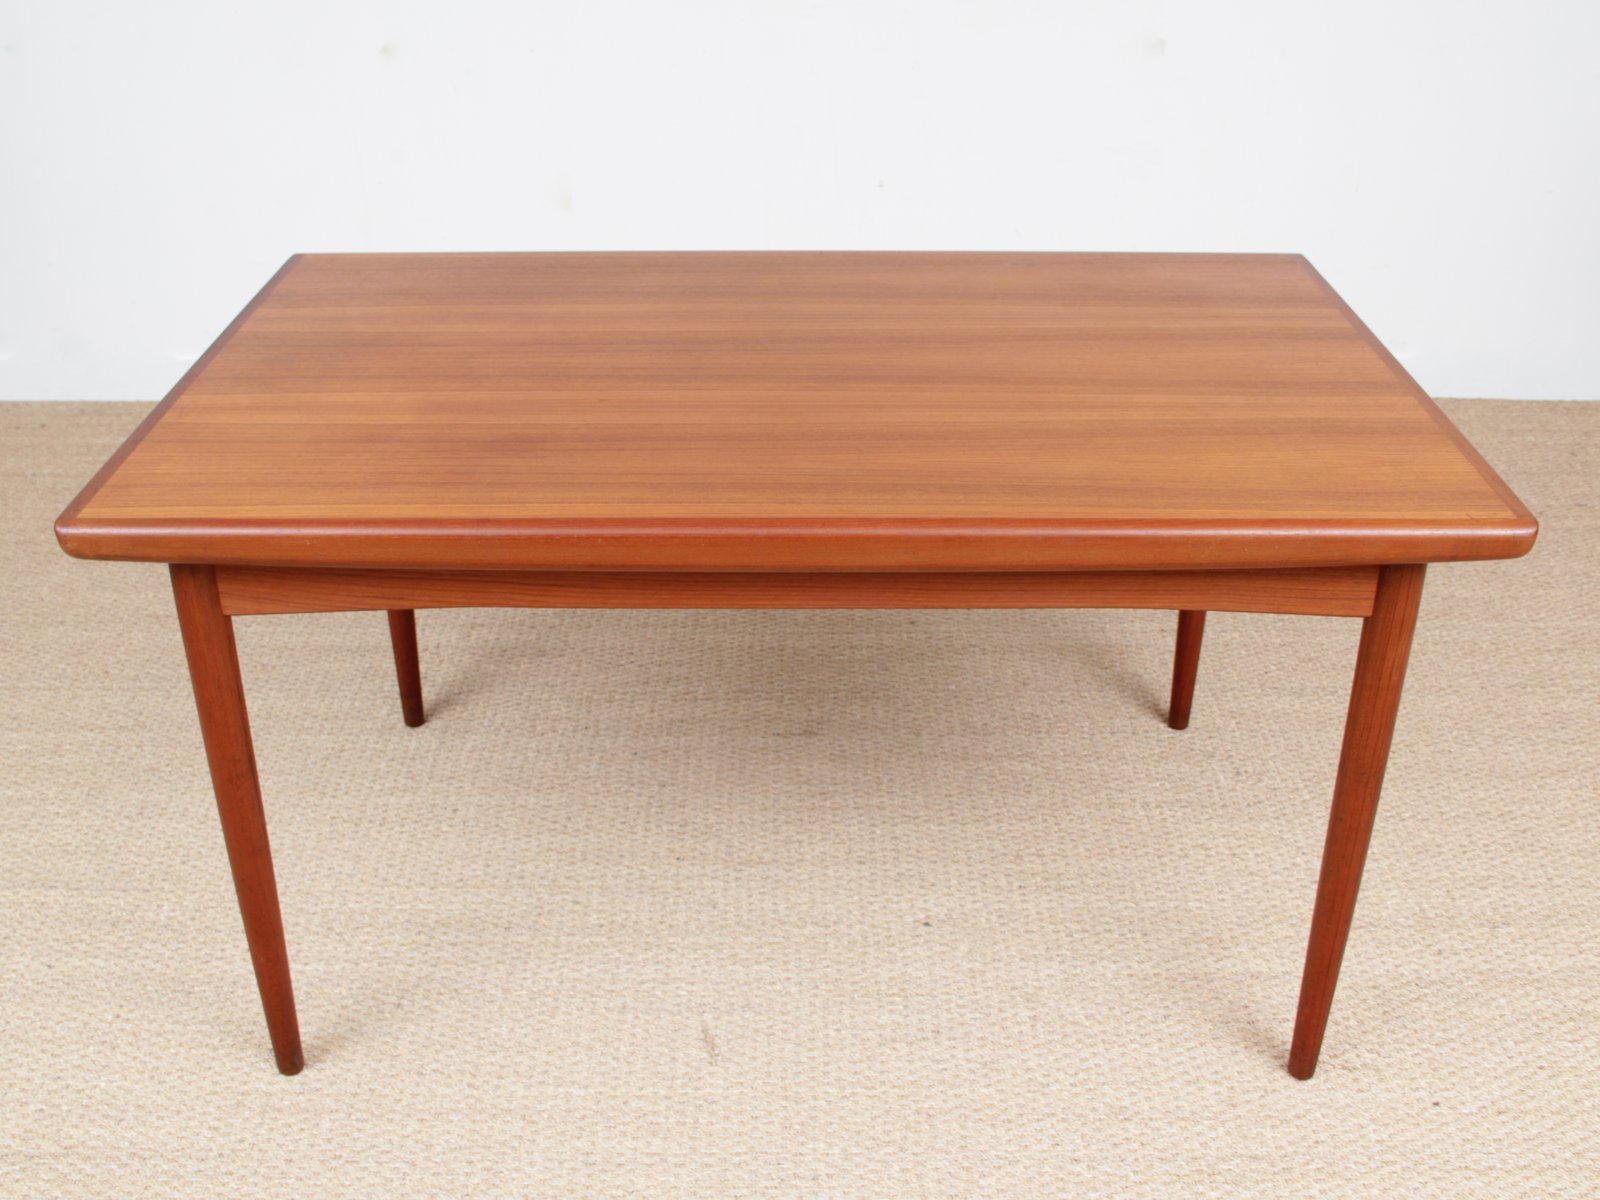 Scandinavian Teak Dining Table From Dyrlund, 1950s